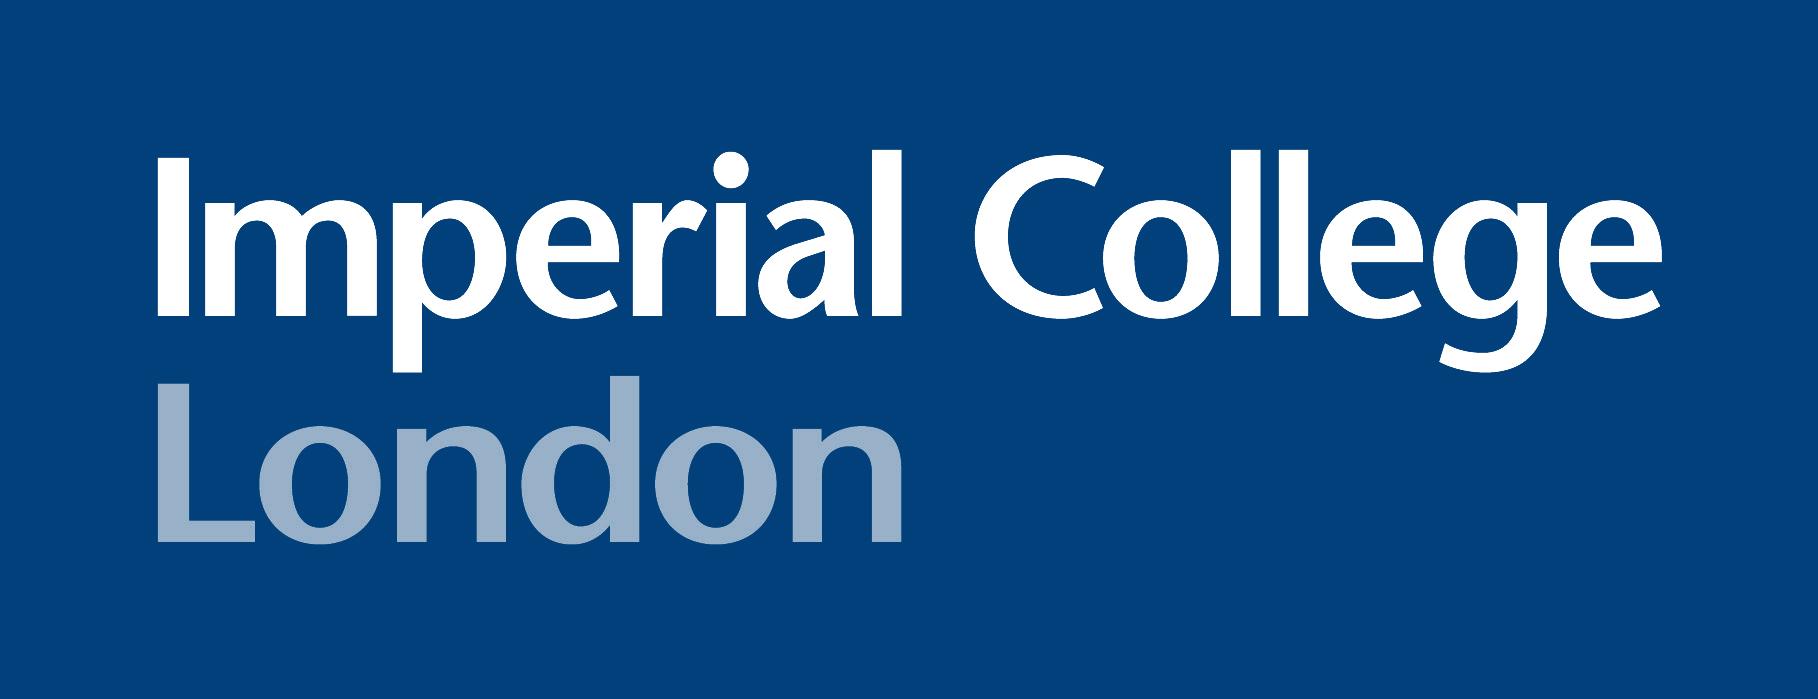 logo - Imperial College London.jpg